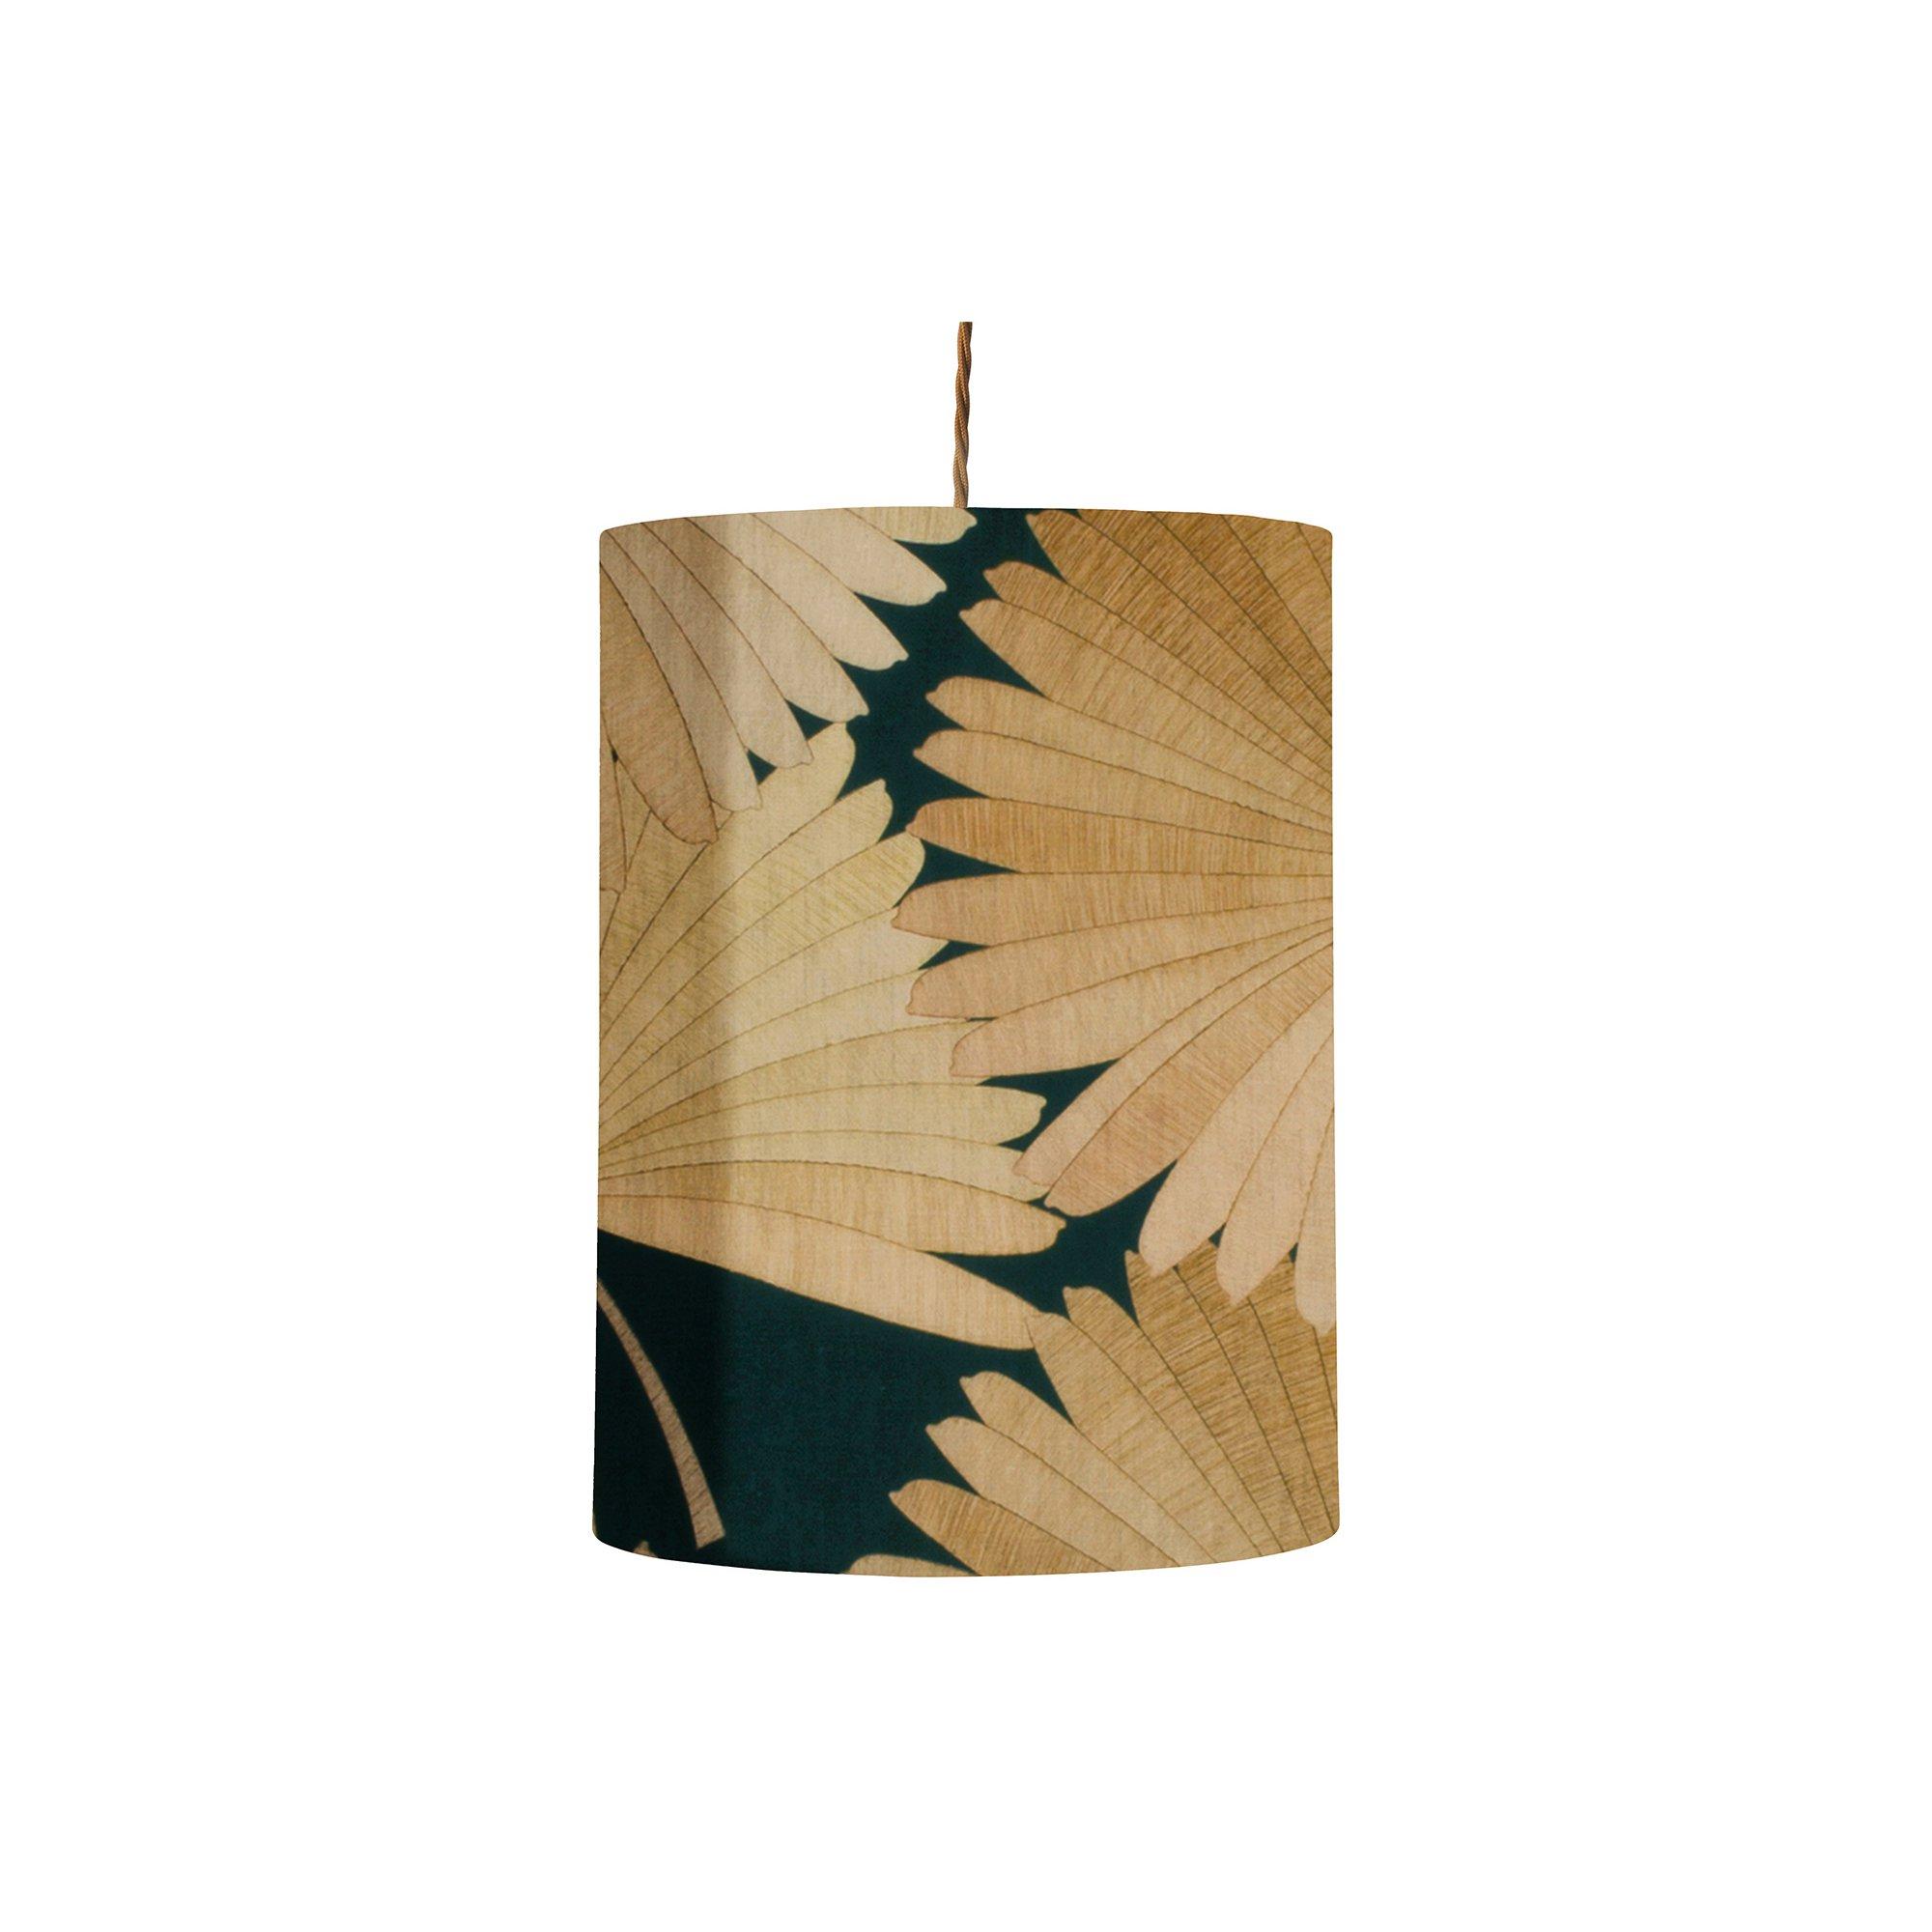 image-Tango Pendant Lamp 30cm x 40cm, Midnight